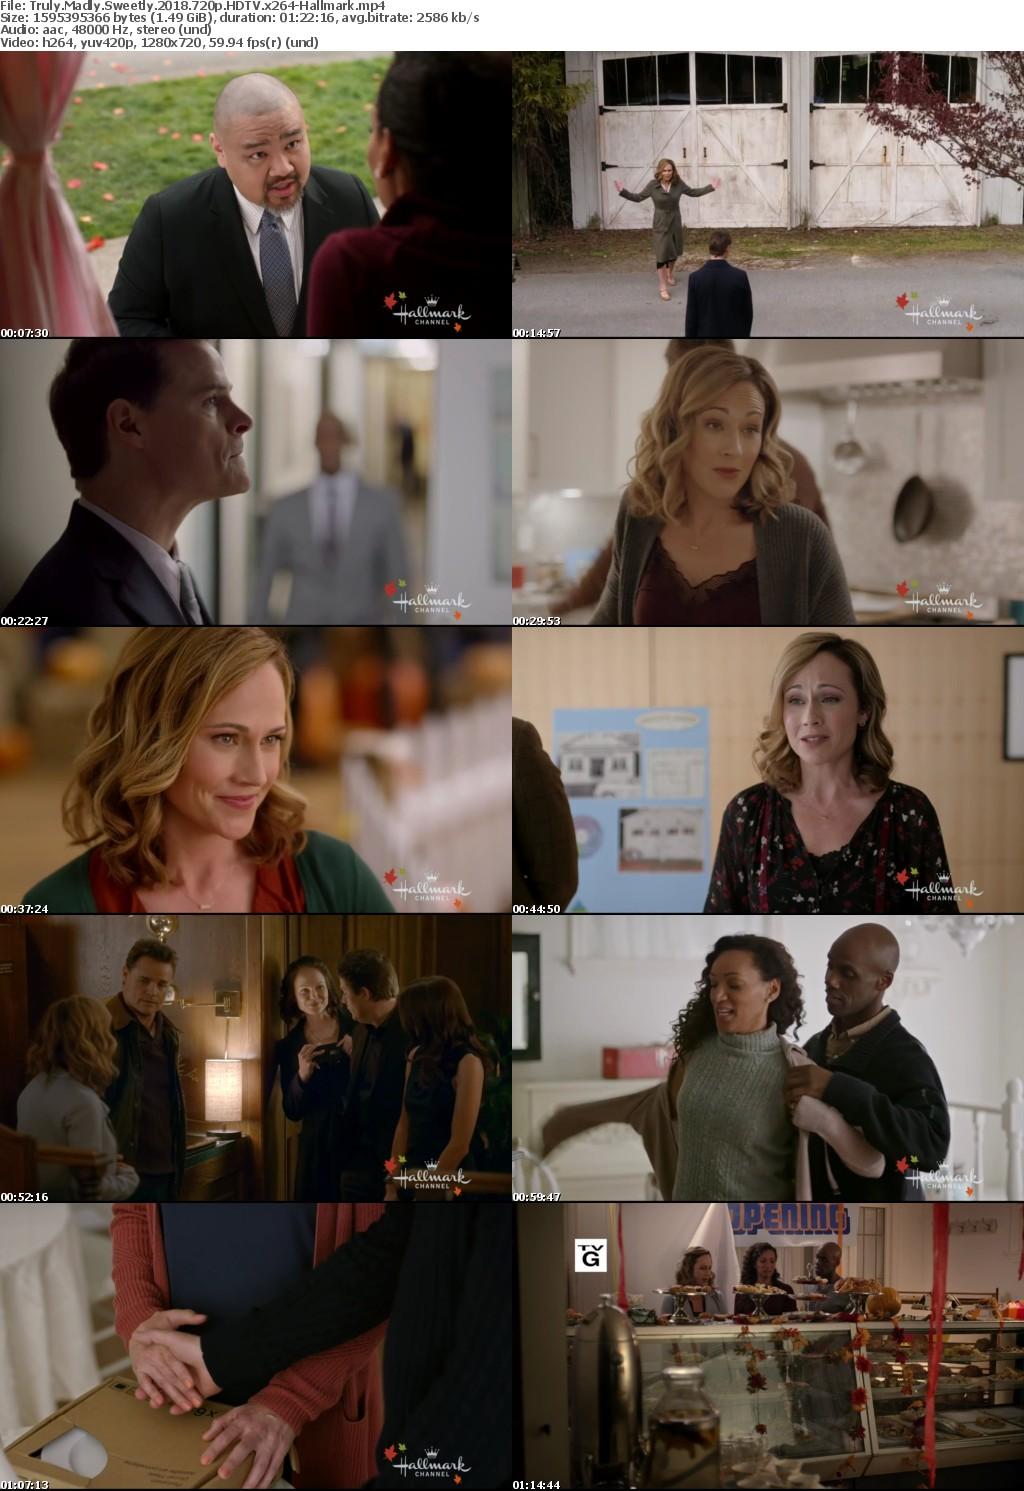 Truly Madly Sweetly (2018) 720p HDTV x264-Hallmark